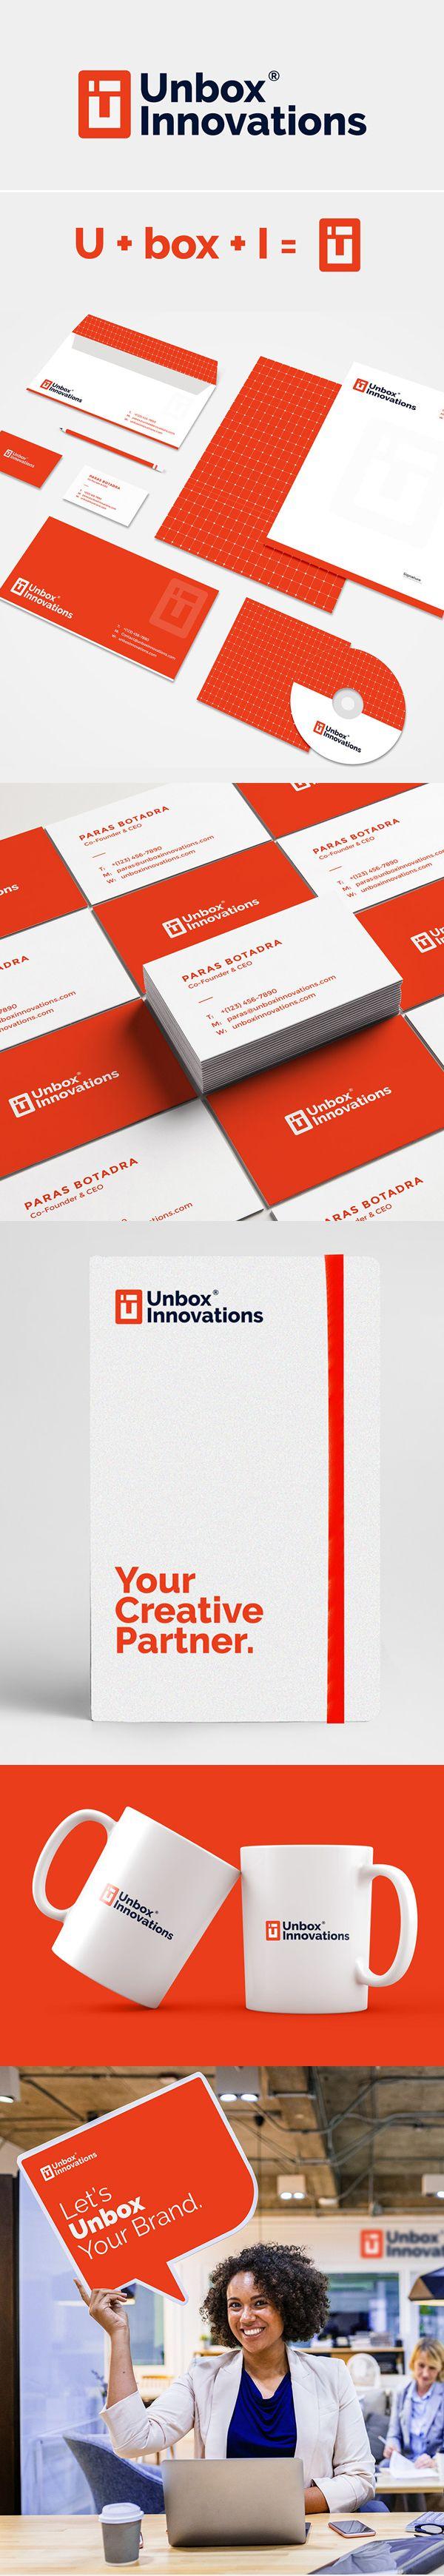 26 New Creative Branding Visual Identity And Logo Design Examples Visual Identity Logo Design Cafe Branding Design